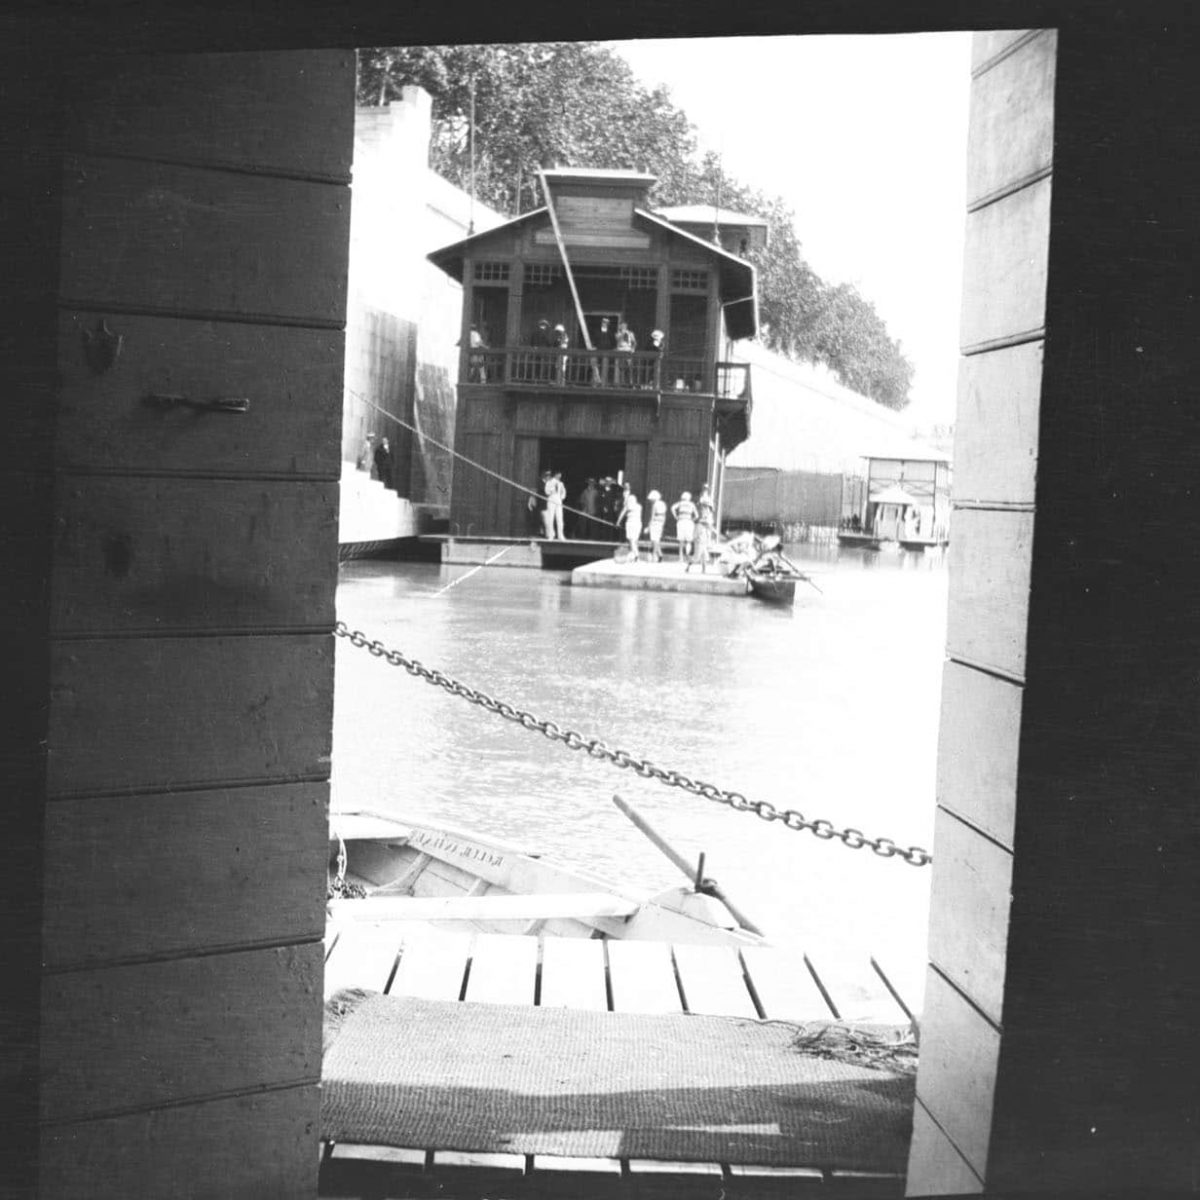 6 - Casina galleggiante sul Tevere